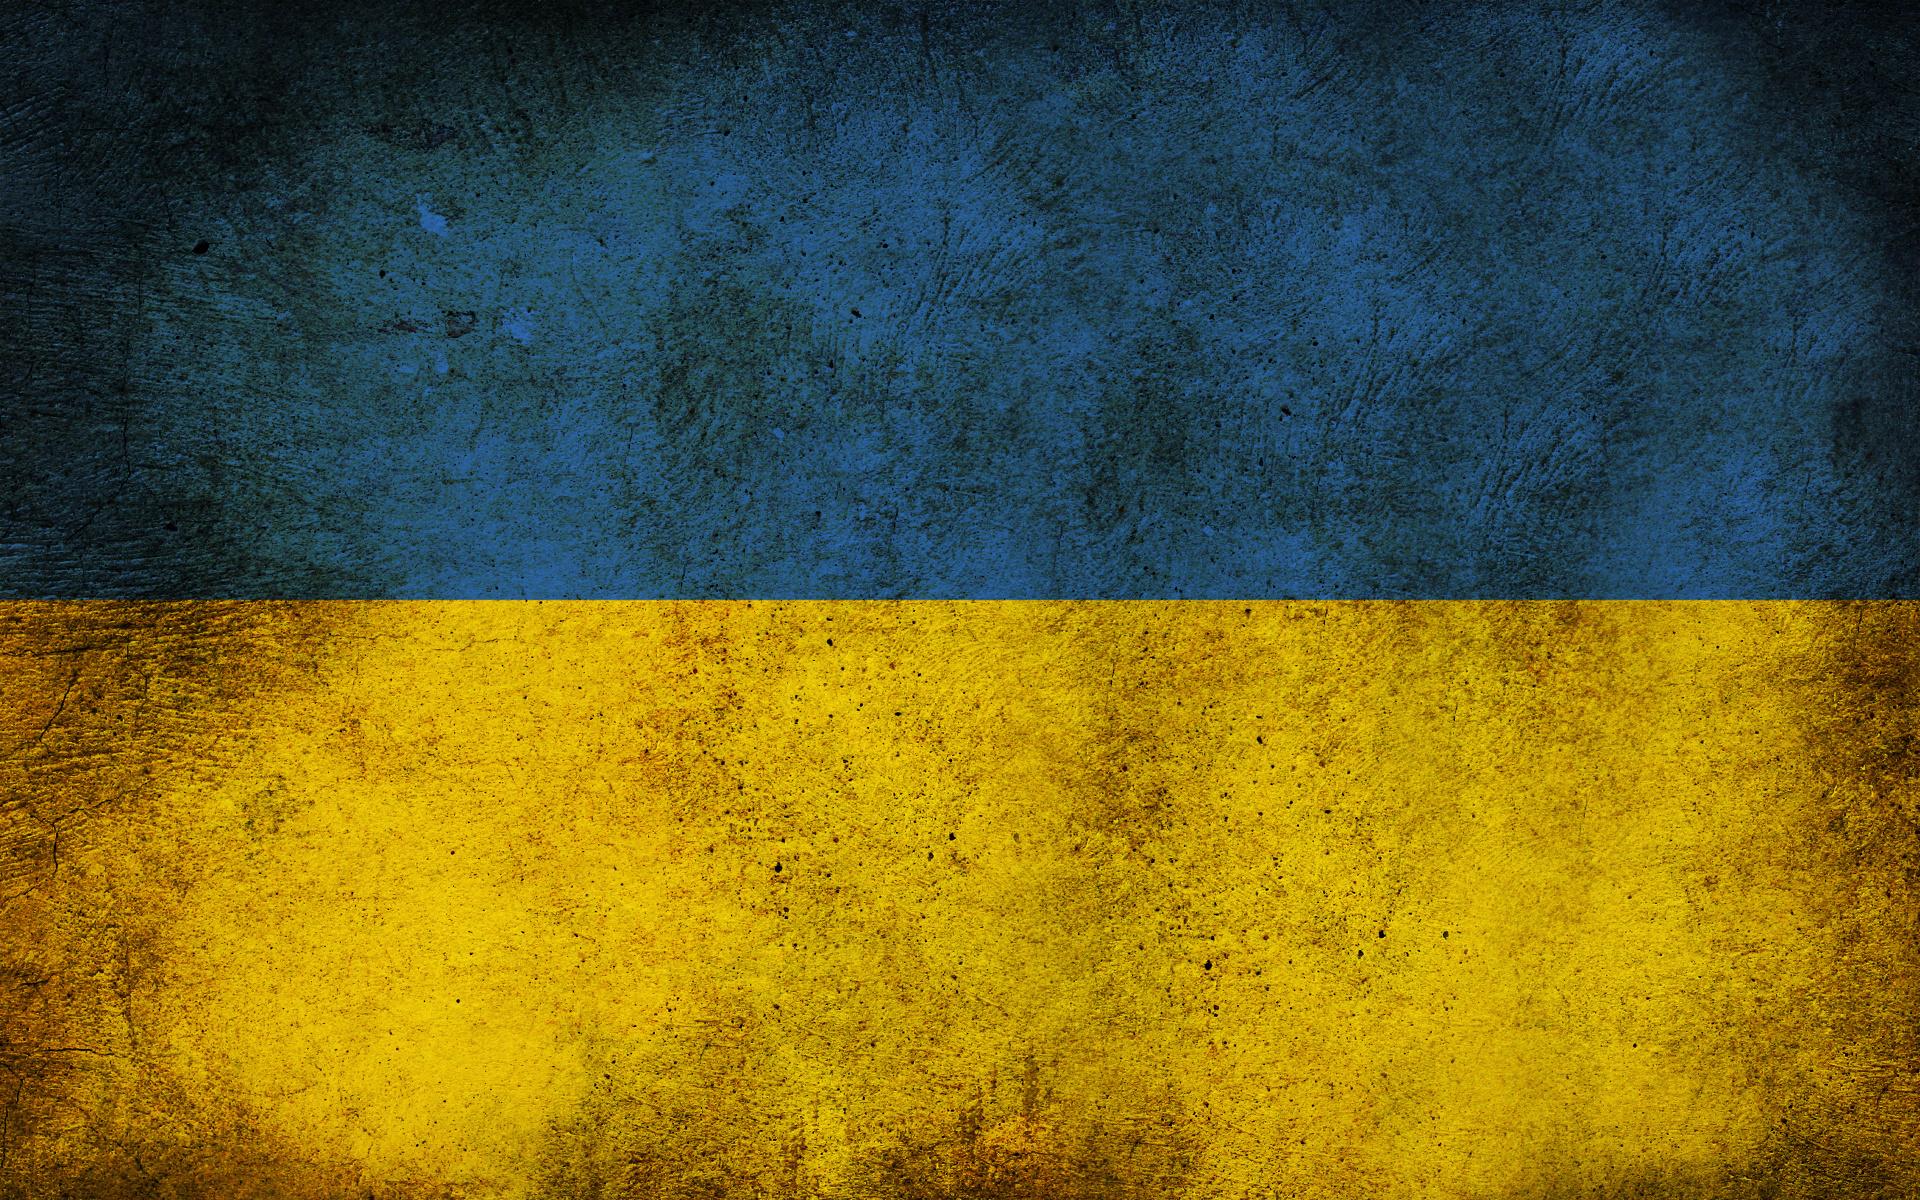 39791 Заставки и Обои Флаги на телефон. Скачать Фон, Флаги картинки бесплатно